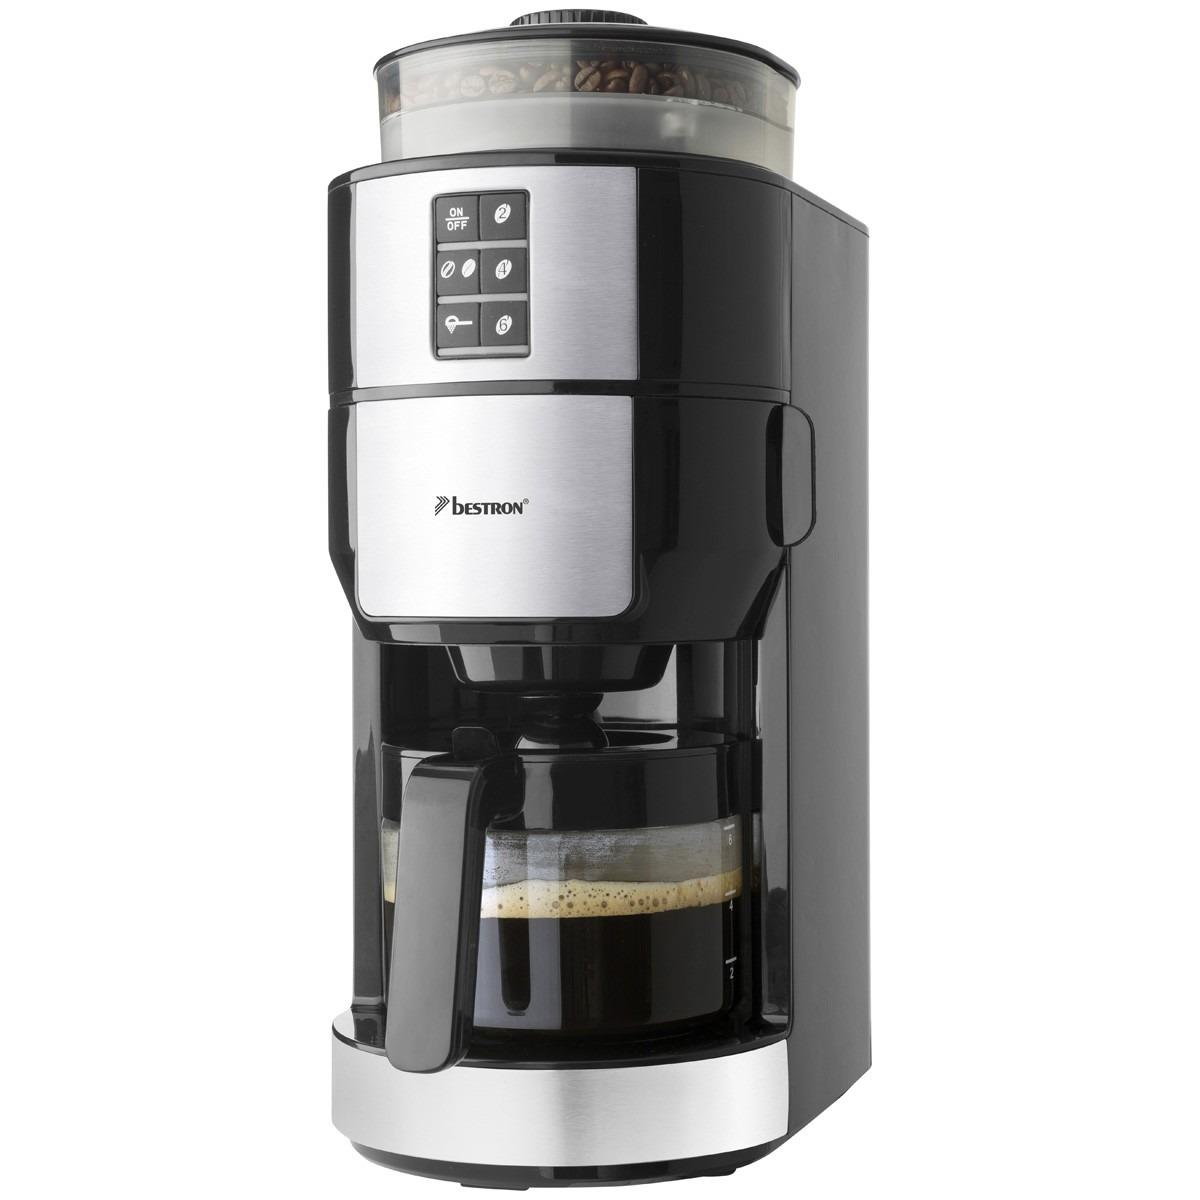 Bestron koffiefilter apparaat ACM1100G